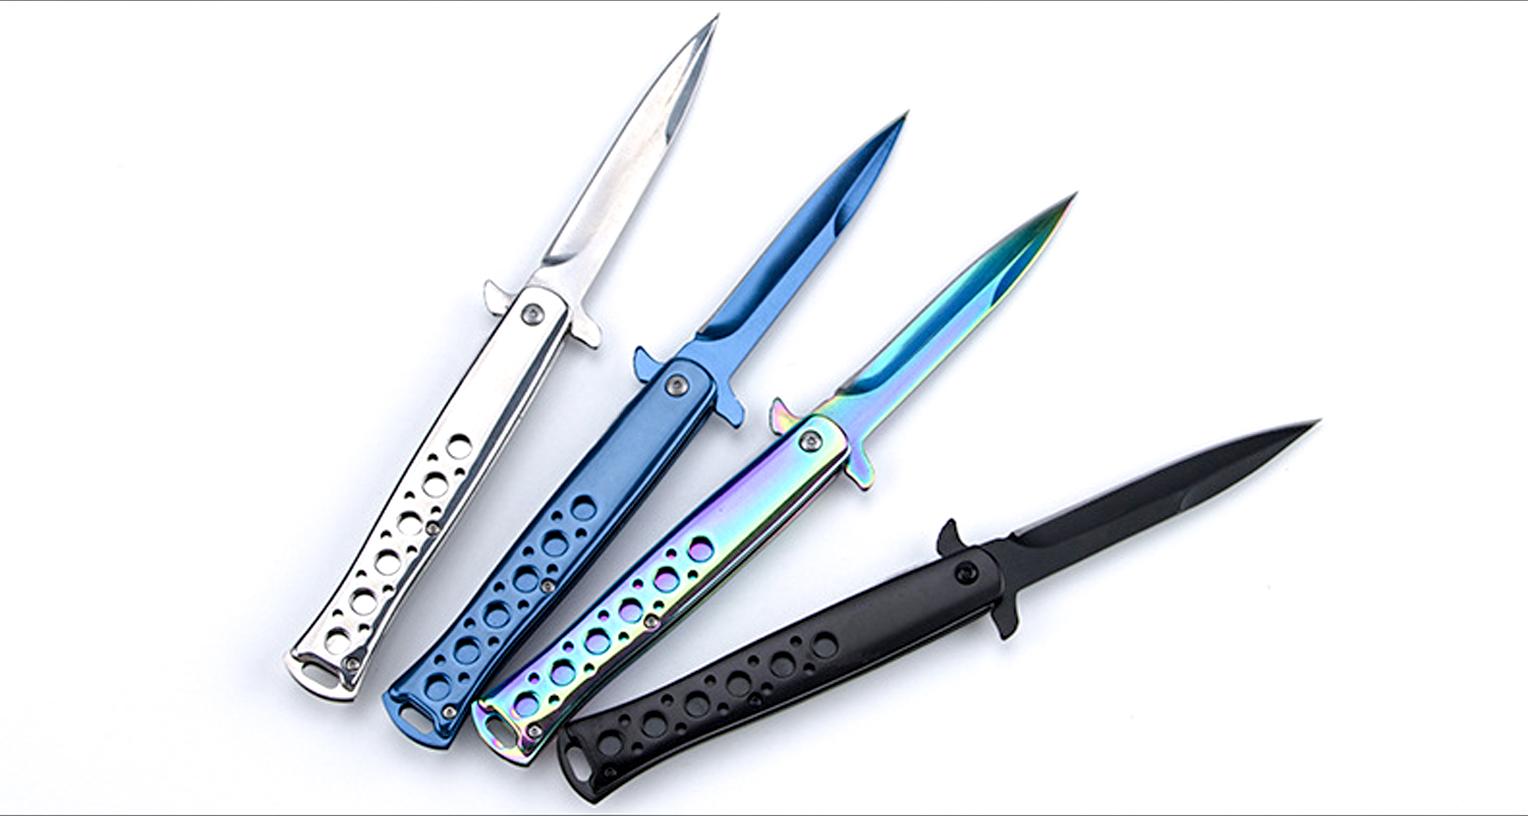 STILETTO KNIFE CSGO Dao Gập Đẹp Đi Rừng số 2